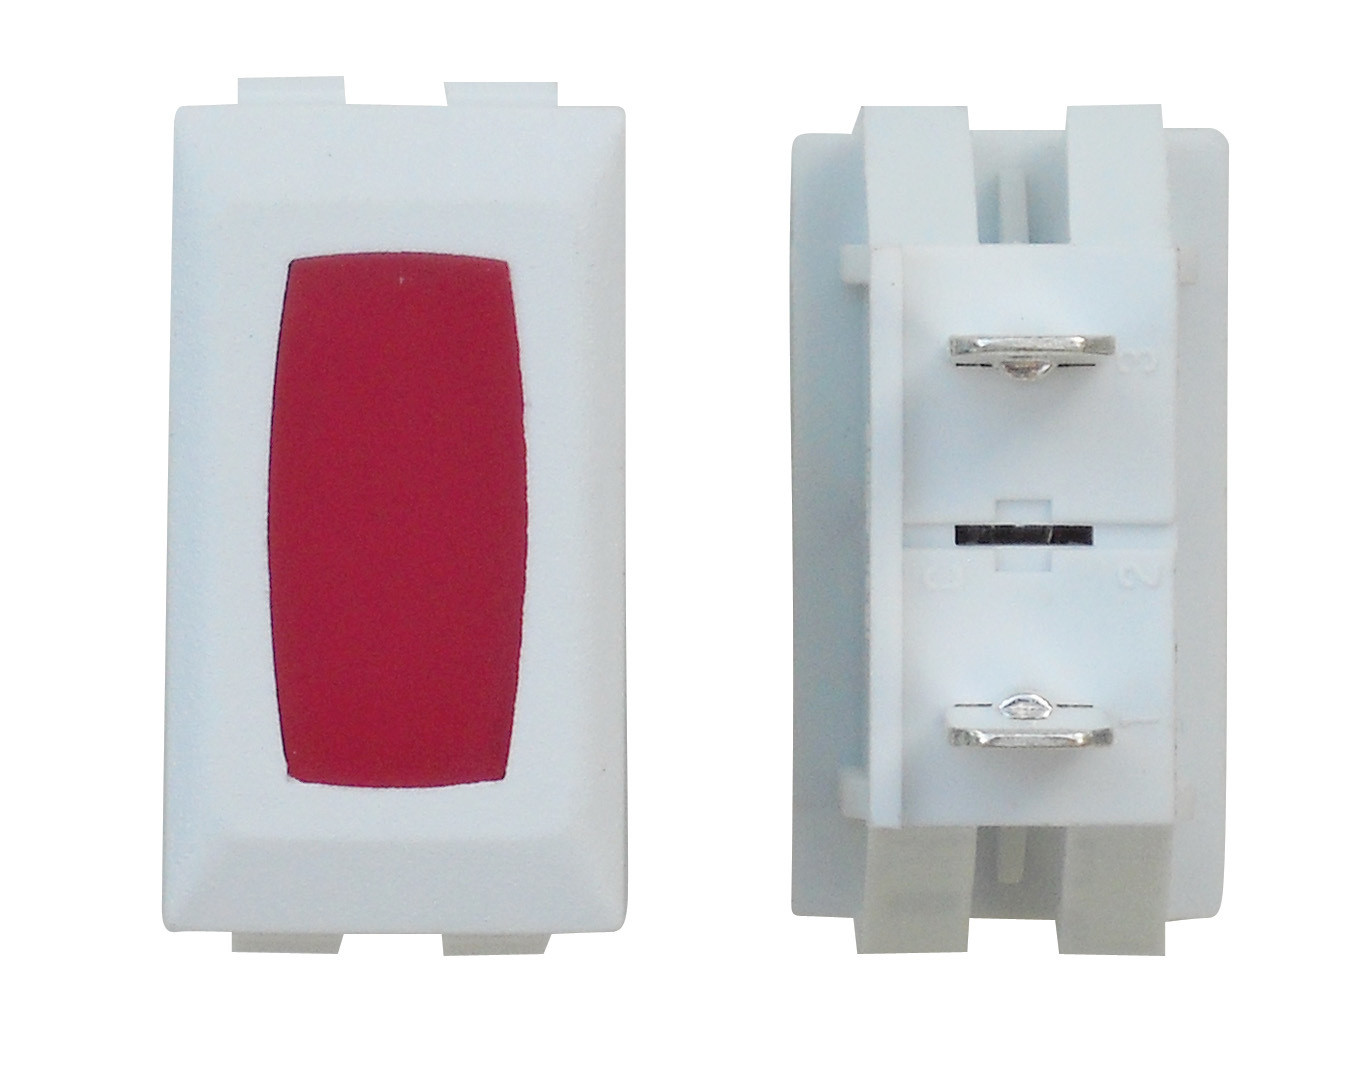 Illuminated Indicator Light - Red/White 1/card